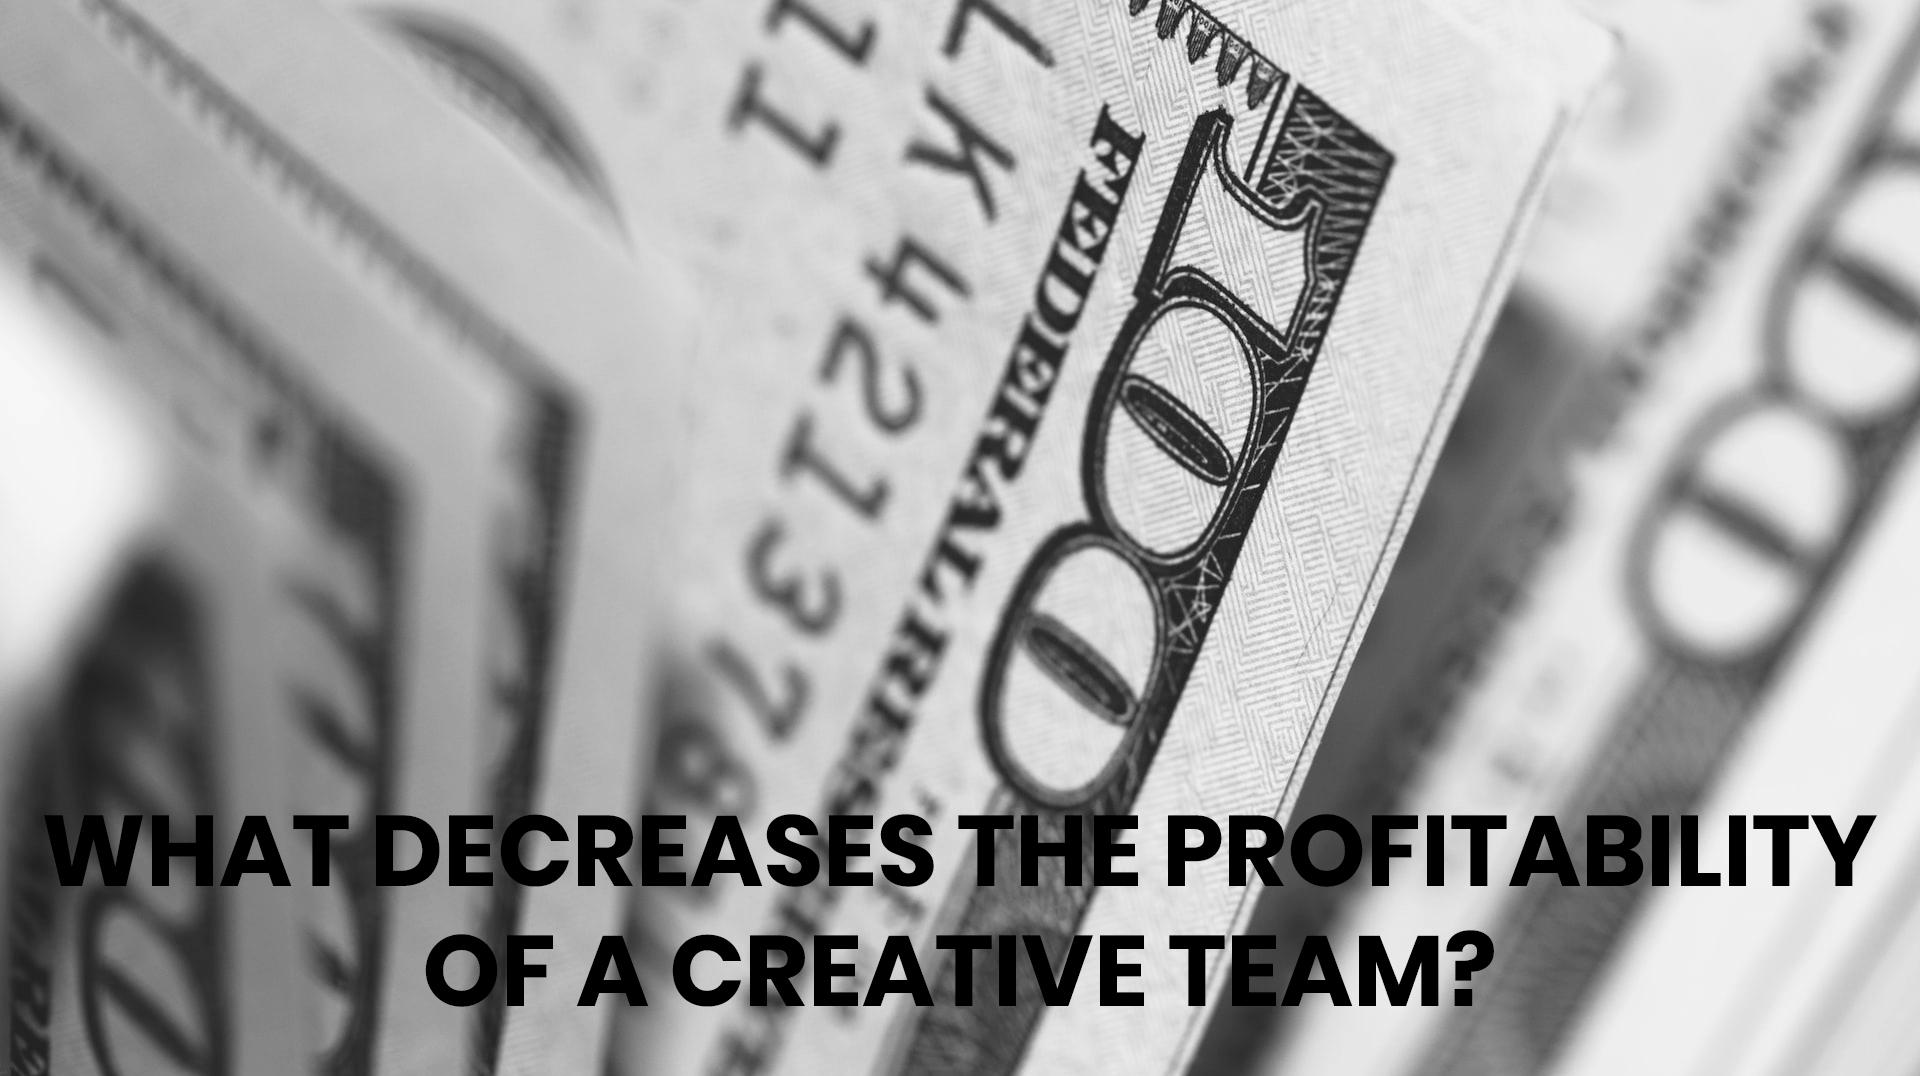 What decreases the profitability of a creative team?